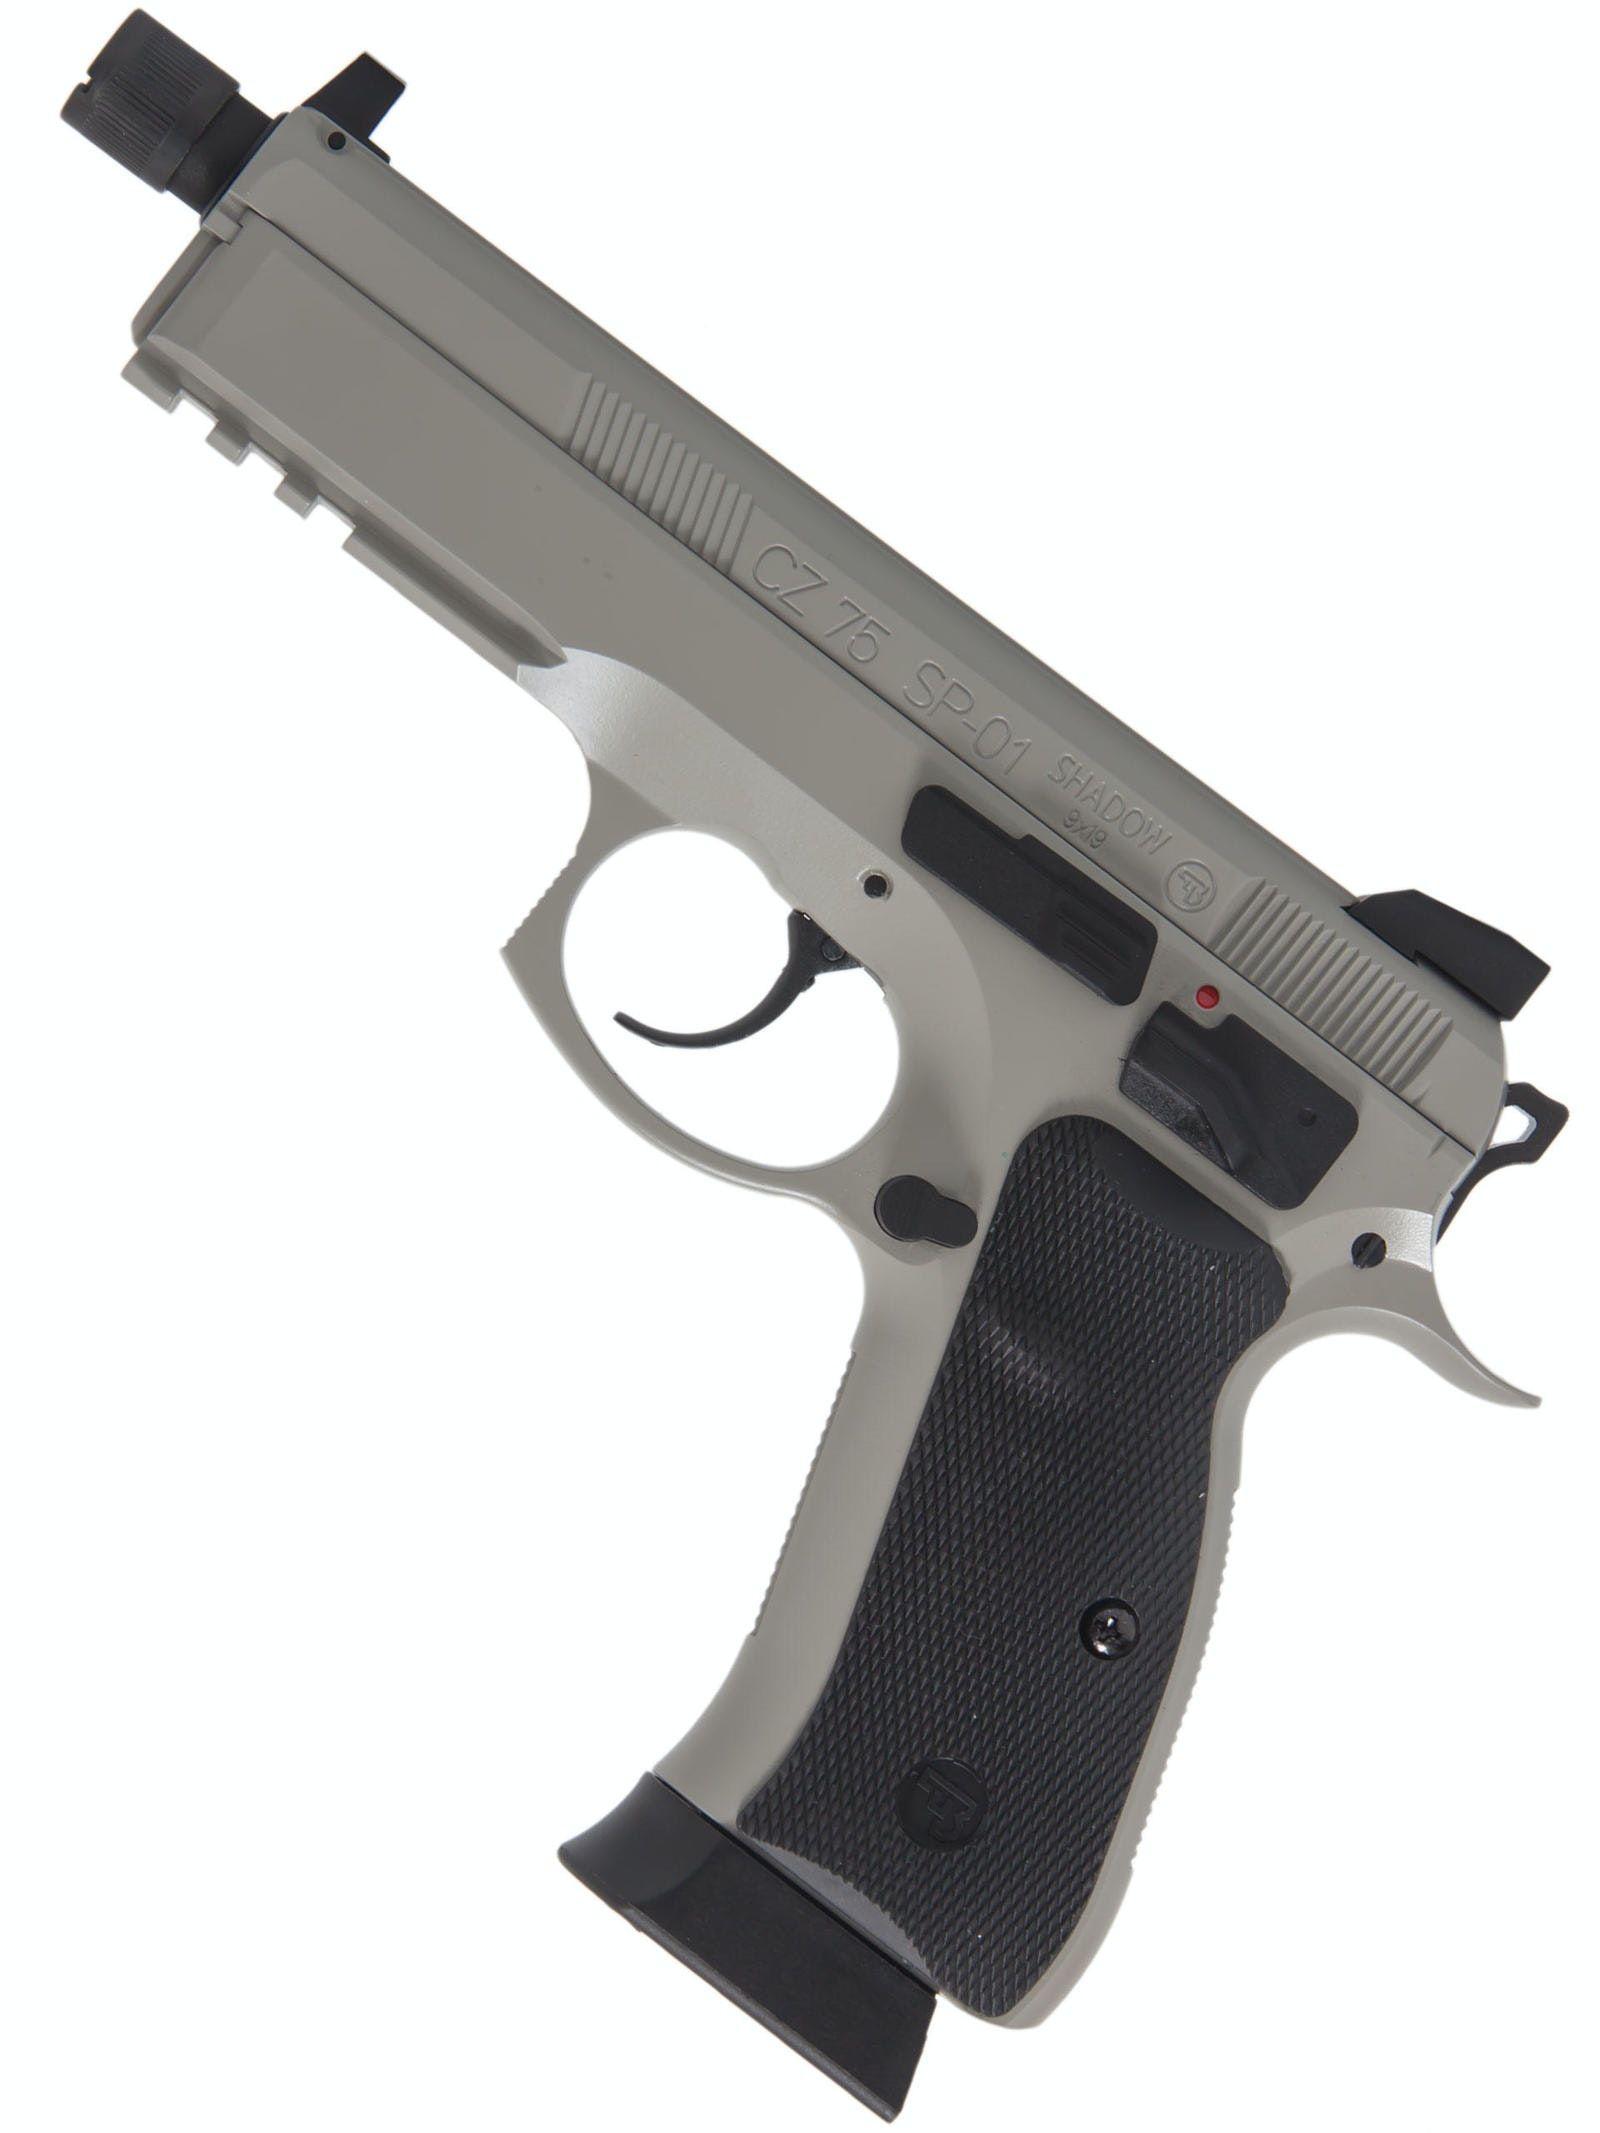 ASG CZ SP01 Shadow CO2 Blowback Pistol in 2020 Cz sp